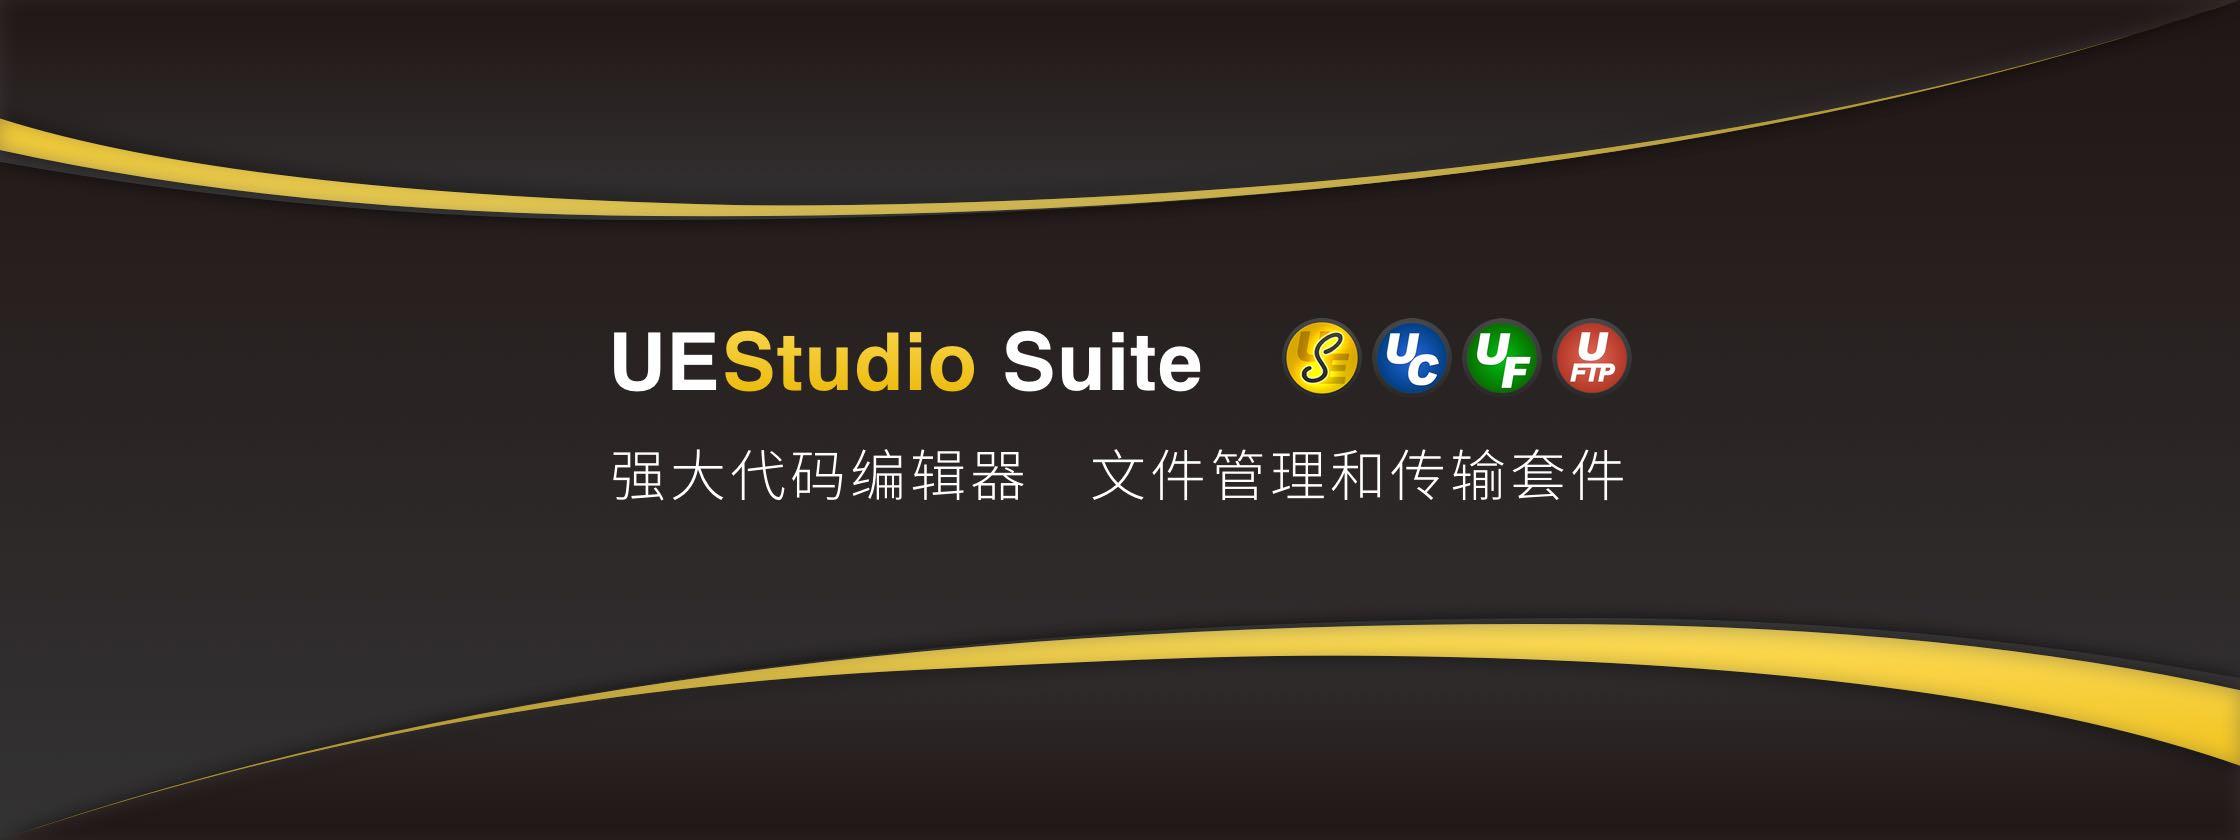 UEStudio Suite,强大的文本编辑器、文件管理和传输套件